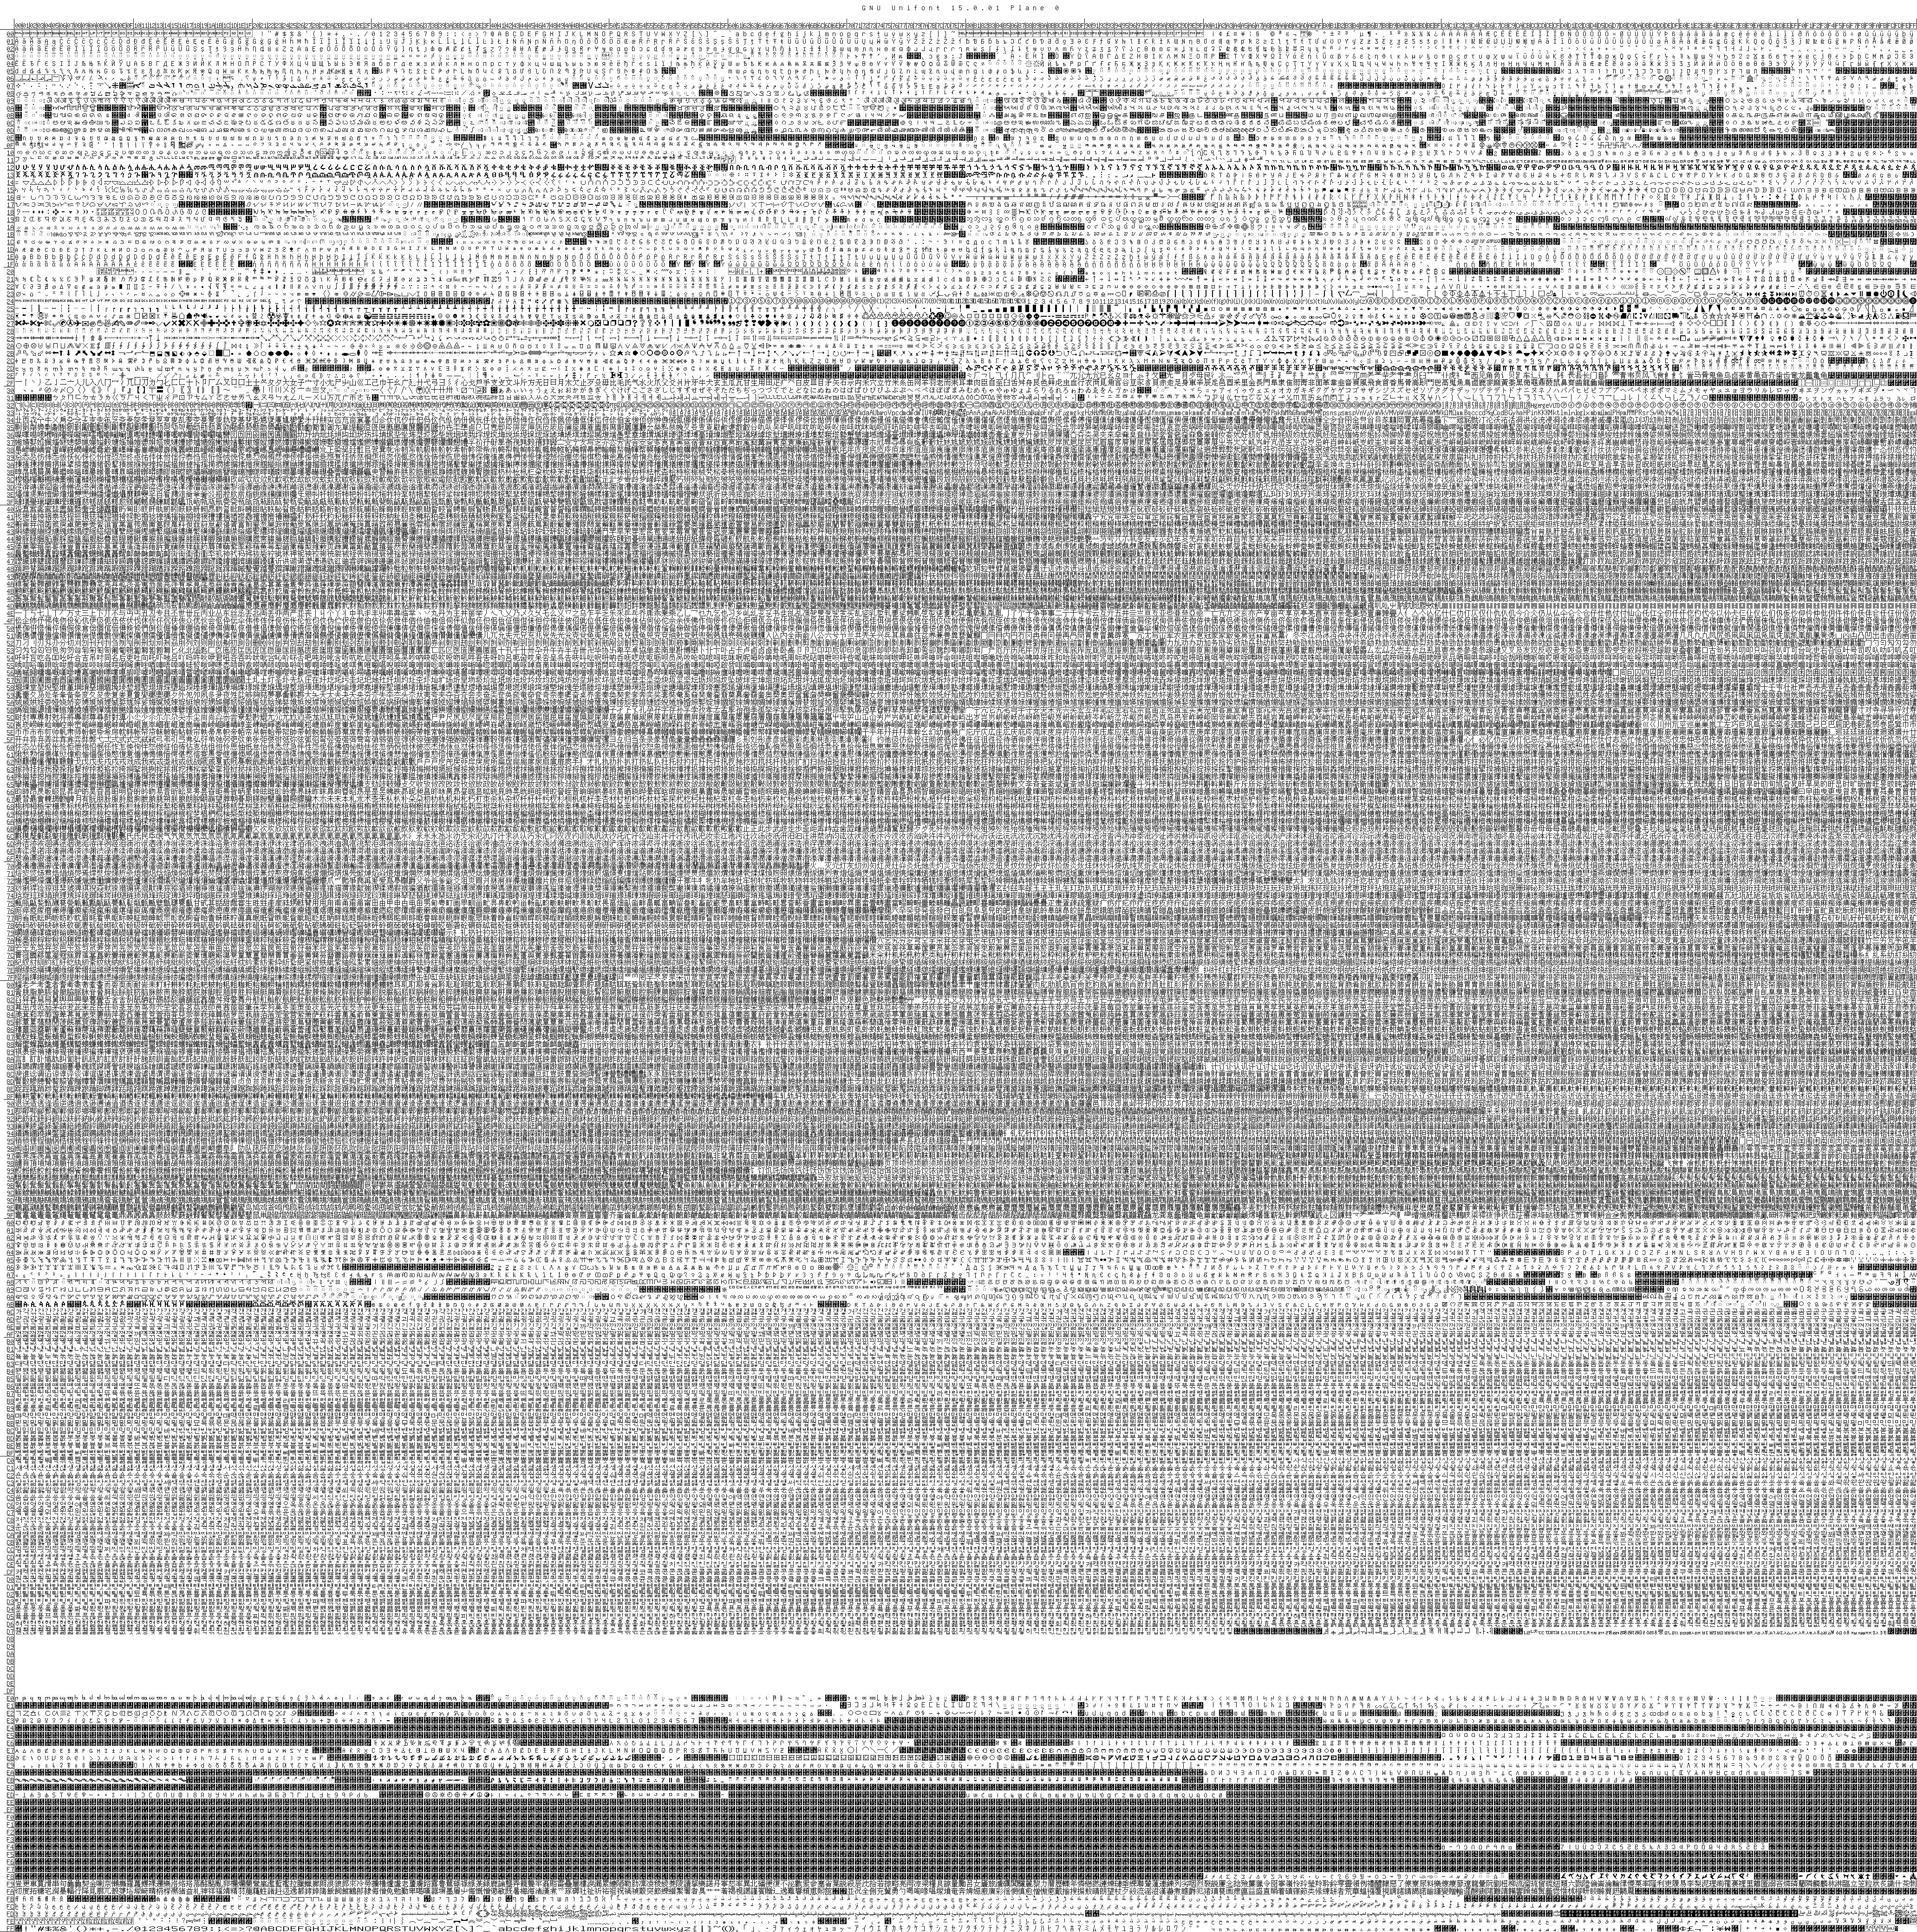 megesco bináris opció)